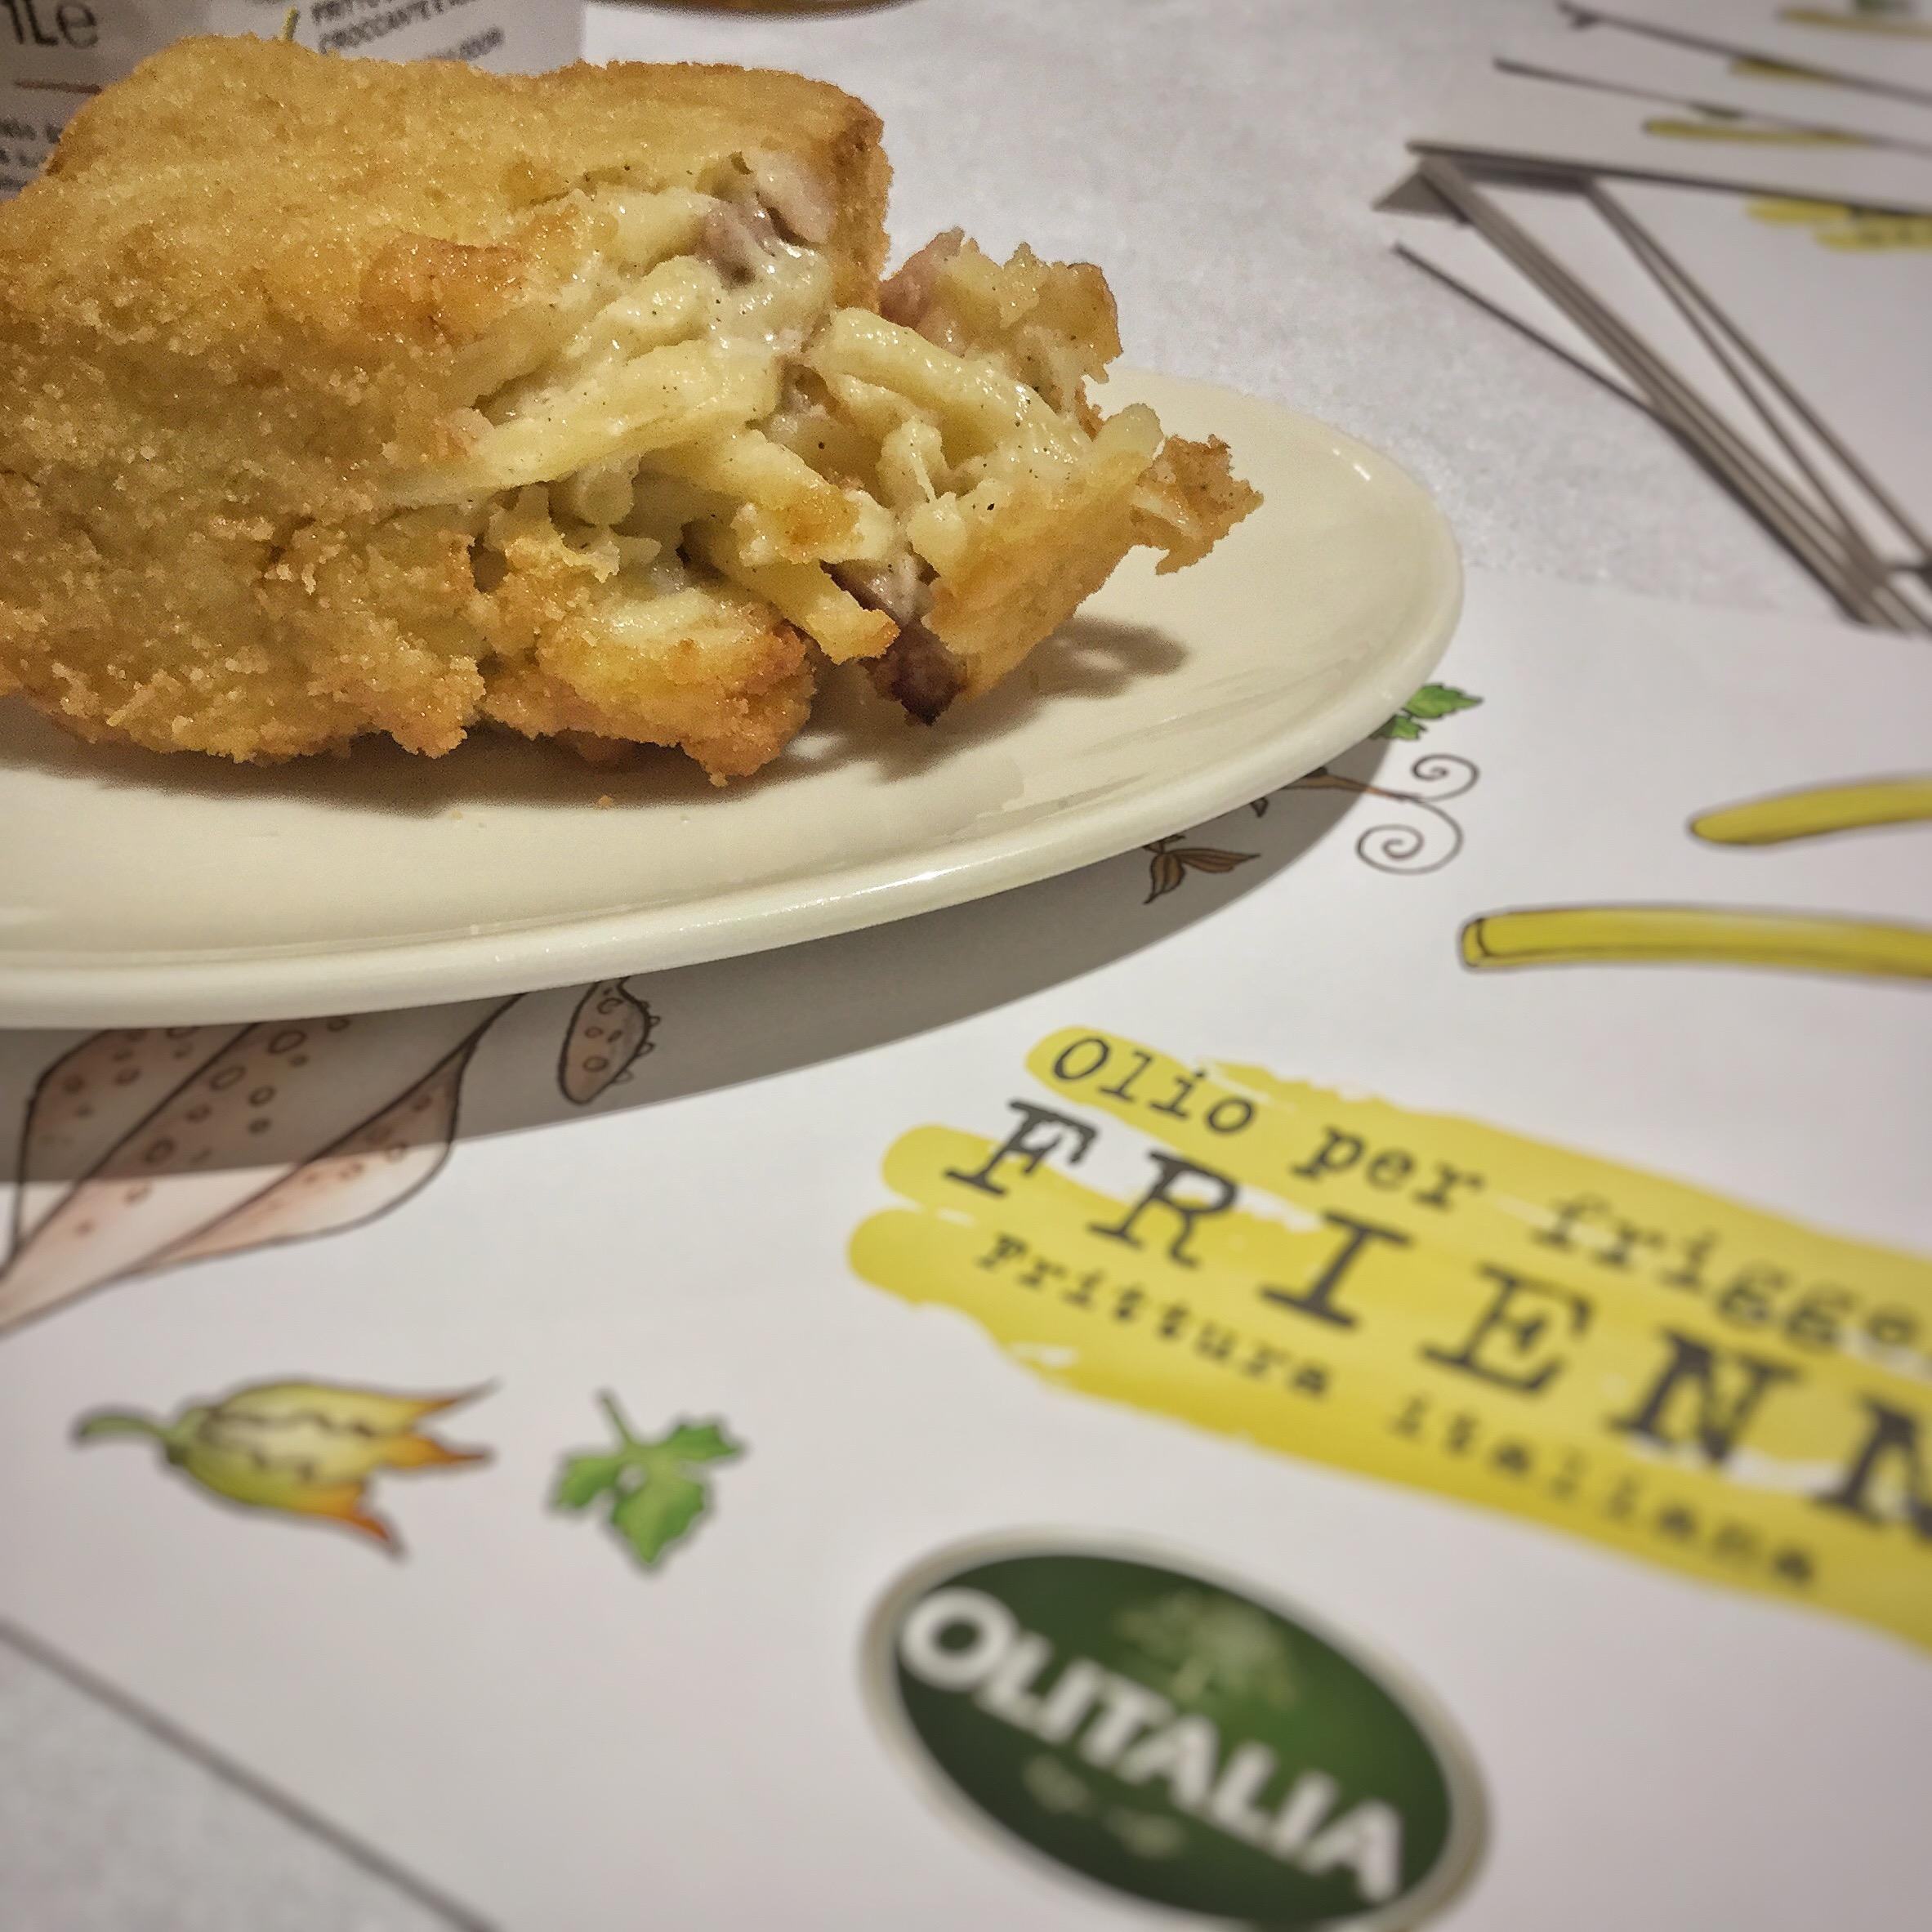 Frienn di Olitalia fritto sano senza segreti